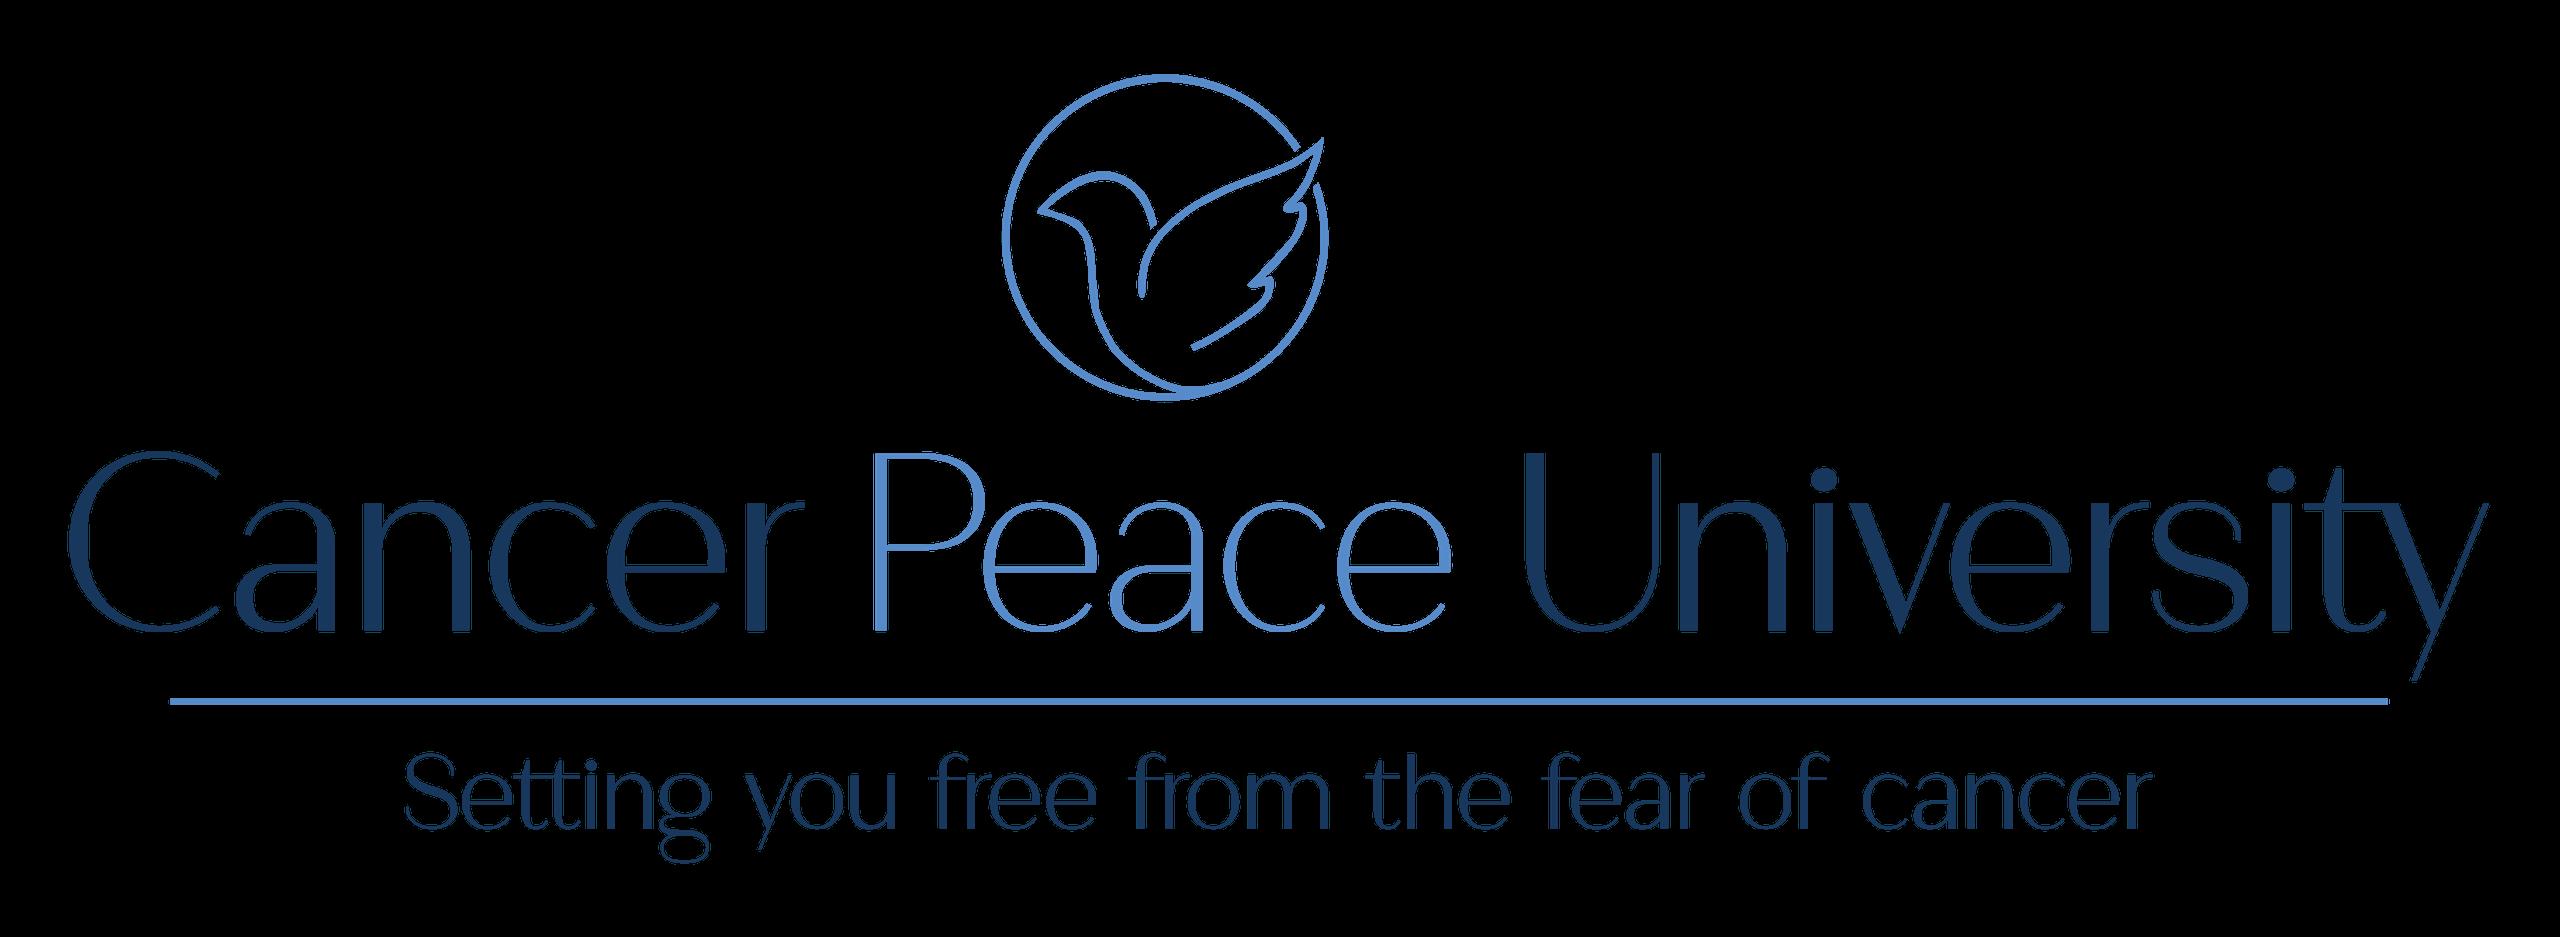 cancer-peace-university